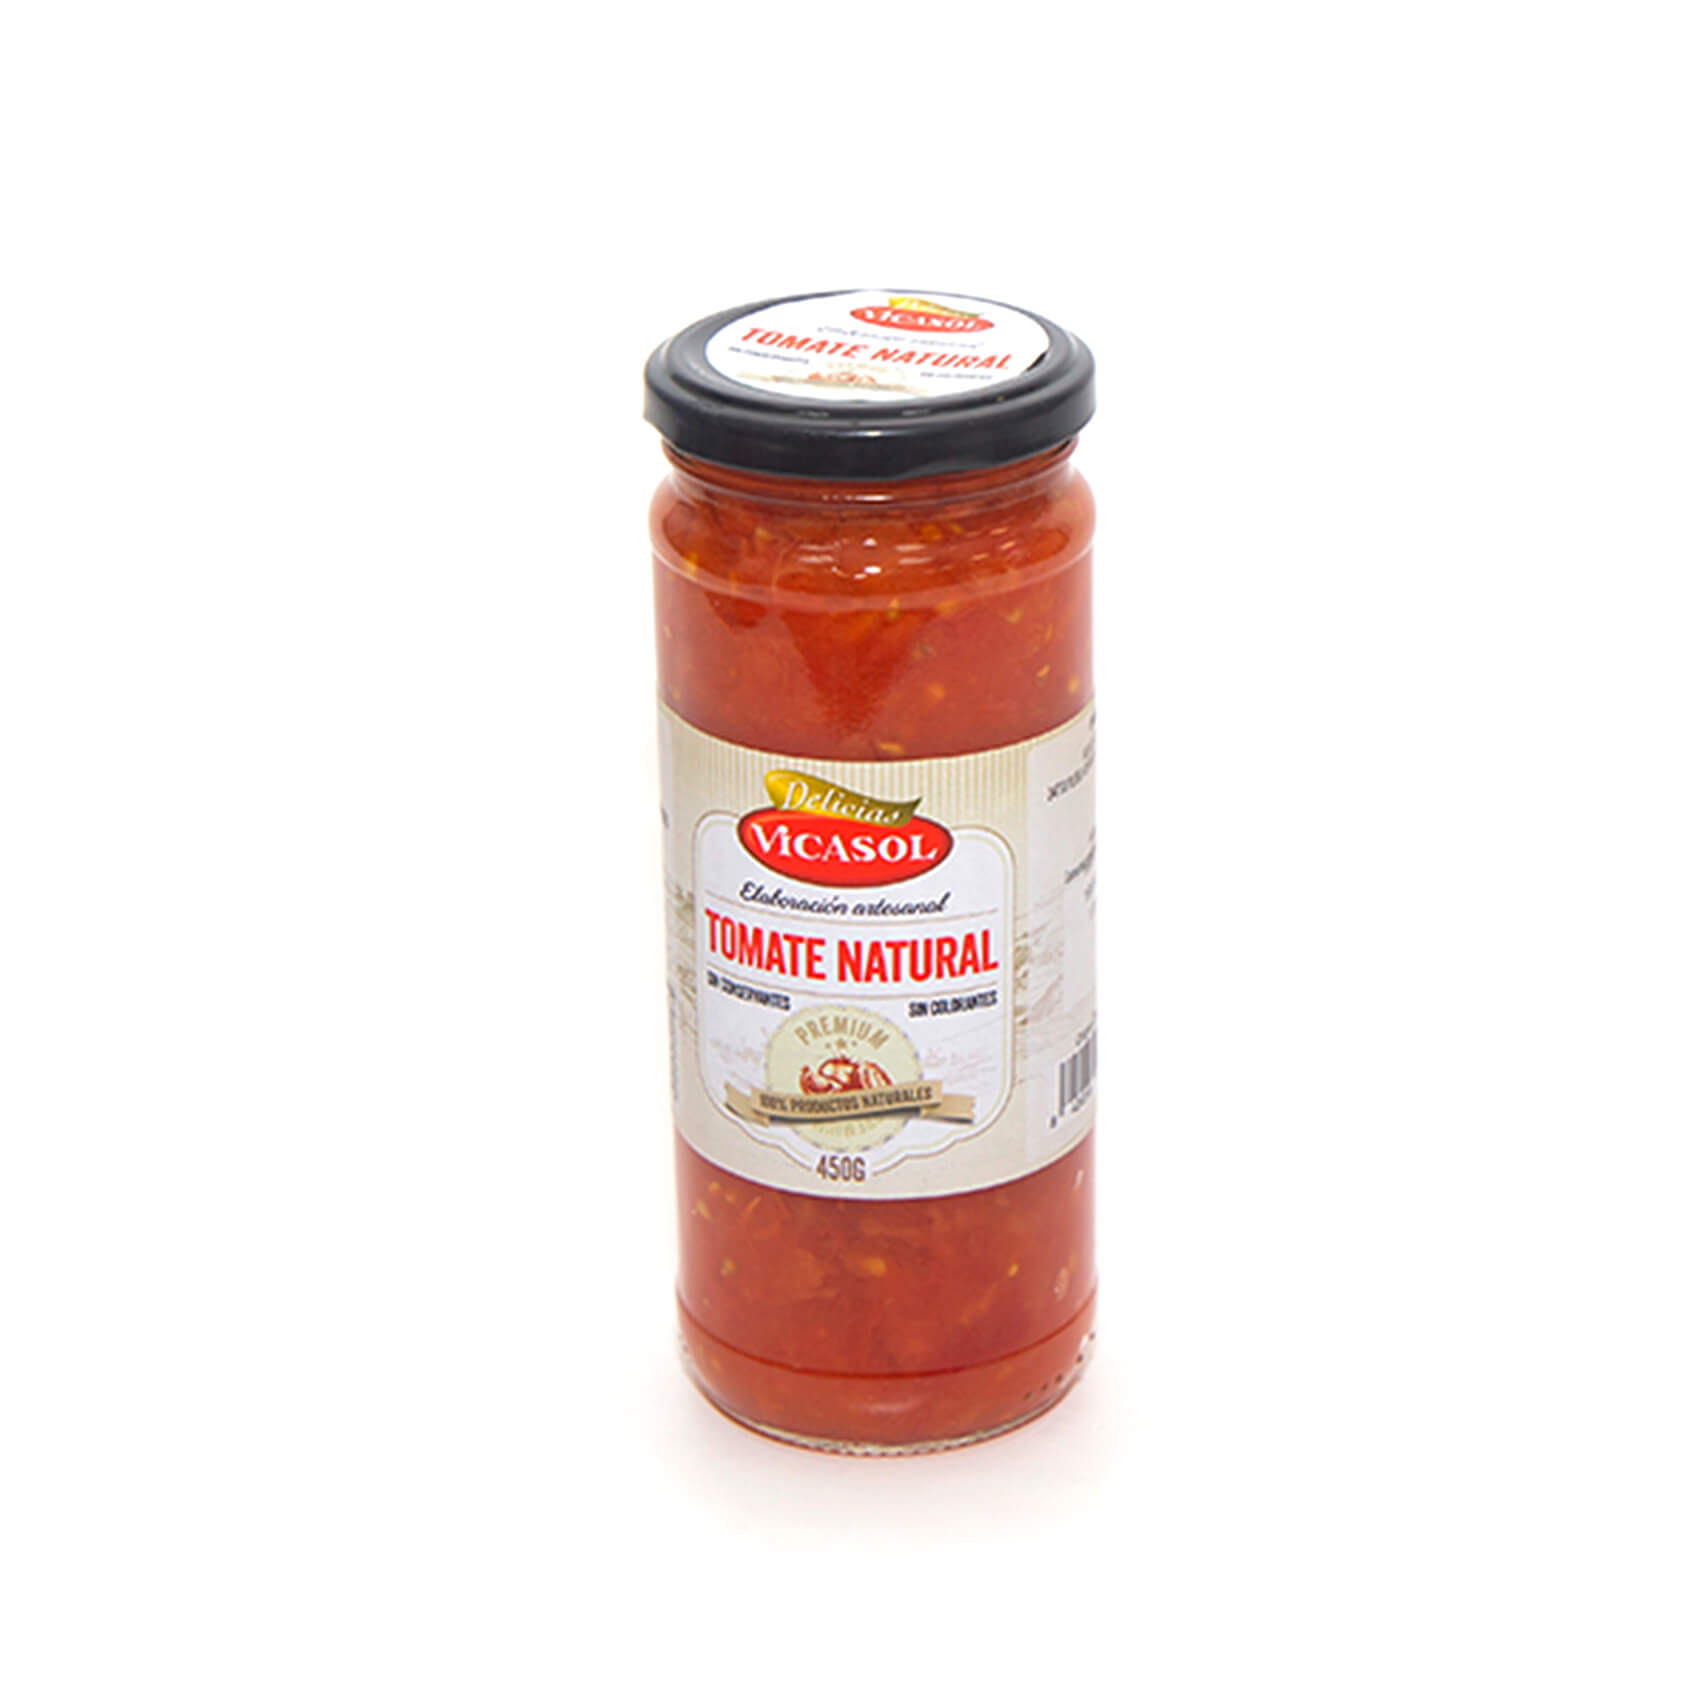 Natural tomato sauce